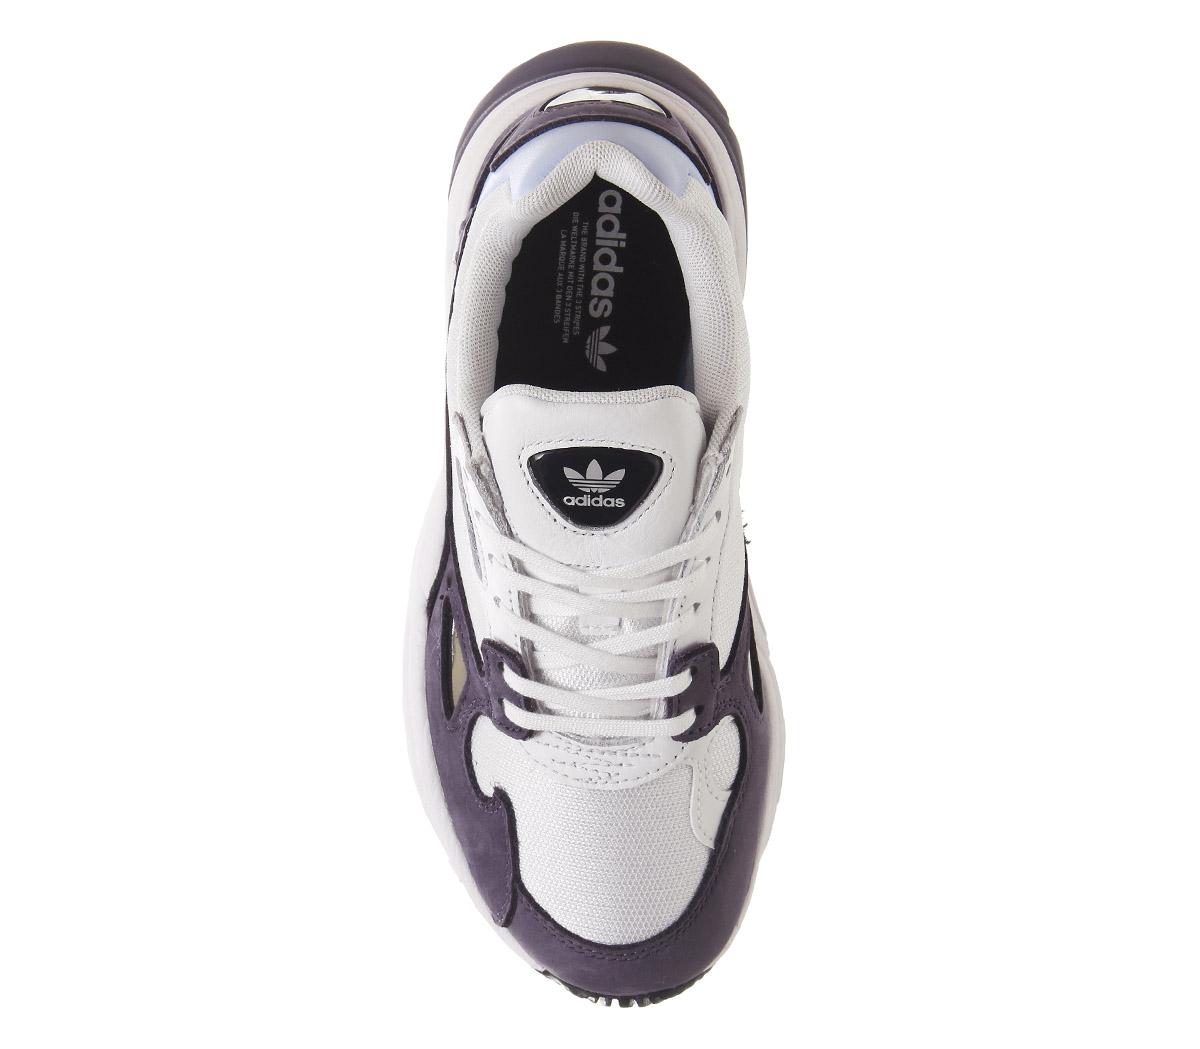 Ginnastica Scarpe Uk 3 Adidas Da Purple W Donna 5 bianca